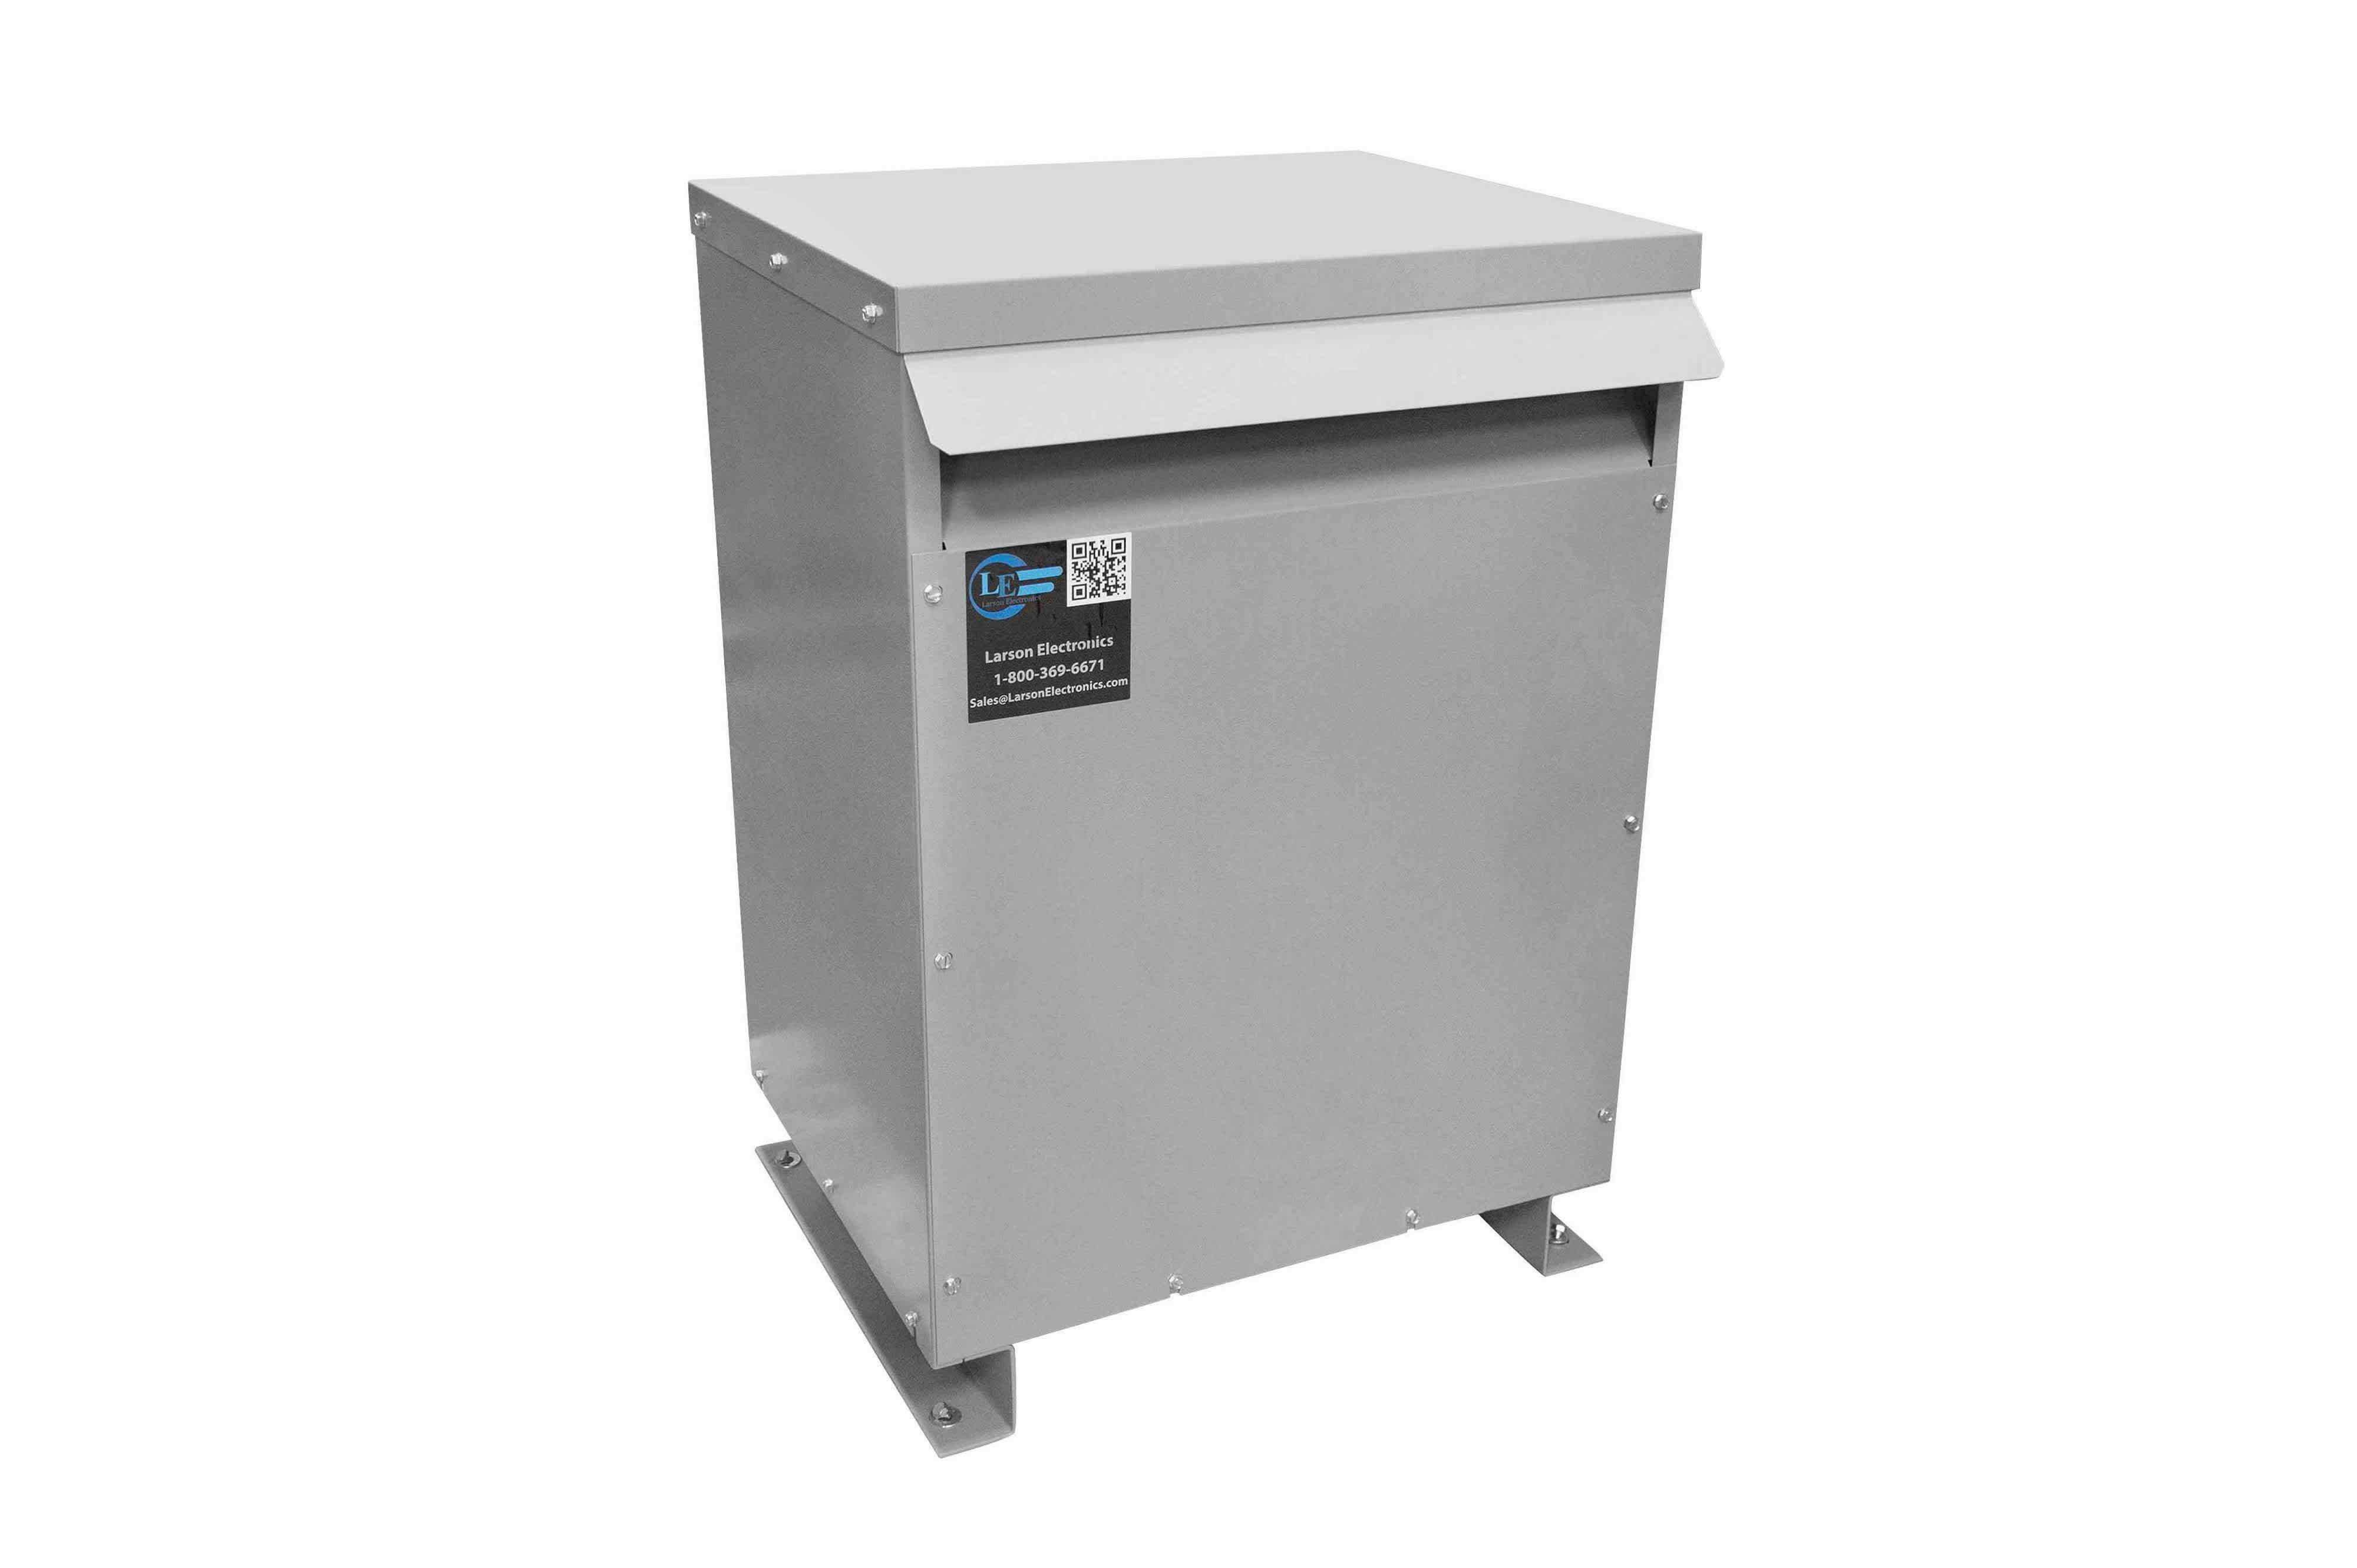 12 kVA 3PH Isolation Transformer, 480V Wye Primary, 600Y/347 Wye-N Secondary, N3R, Ventilated, 60 Hz